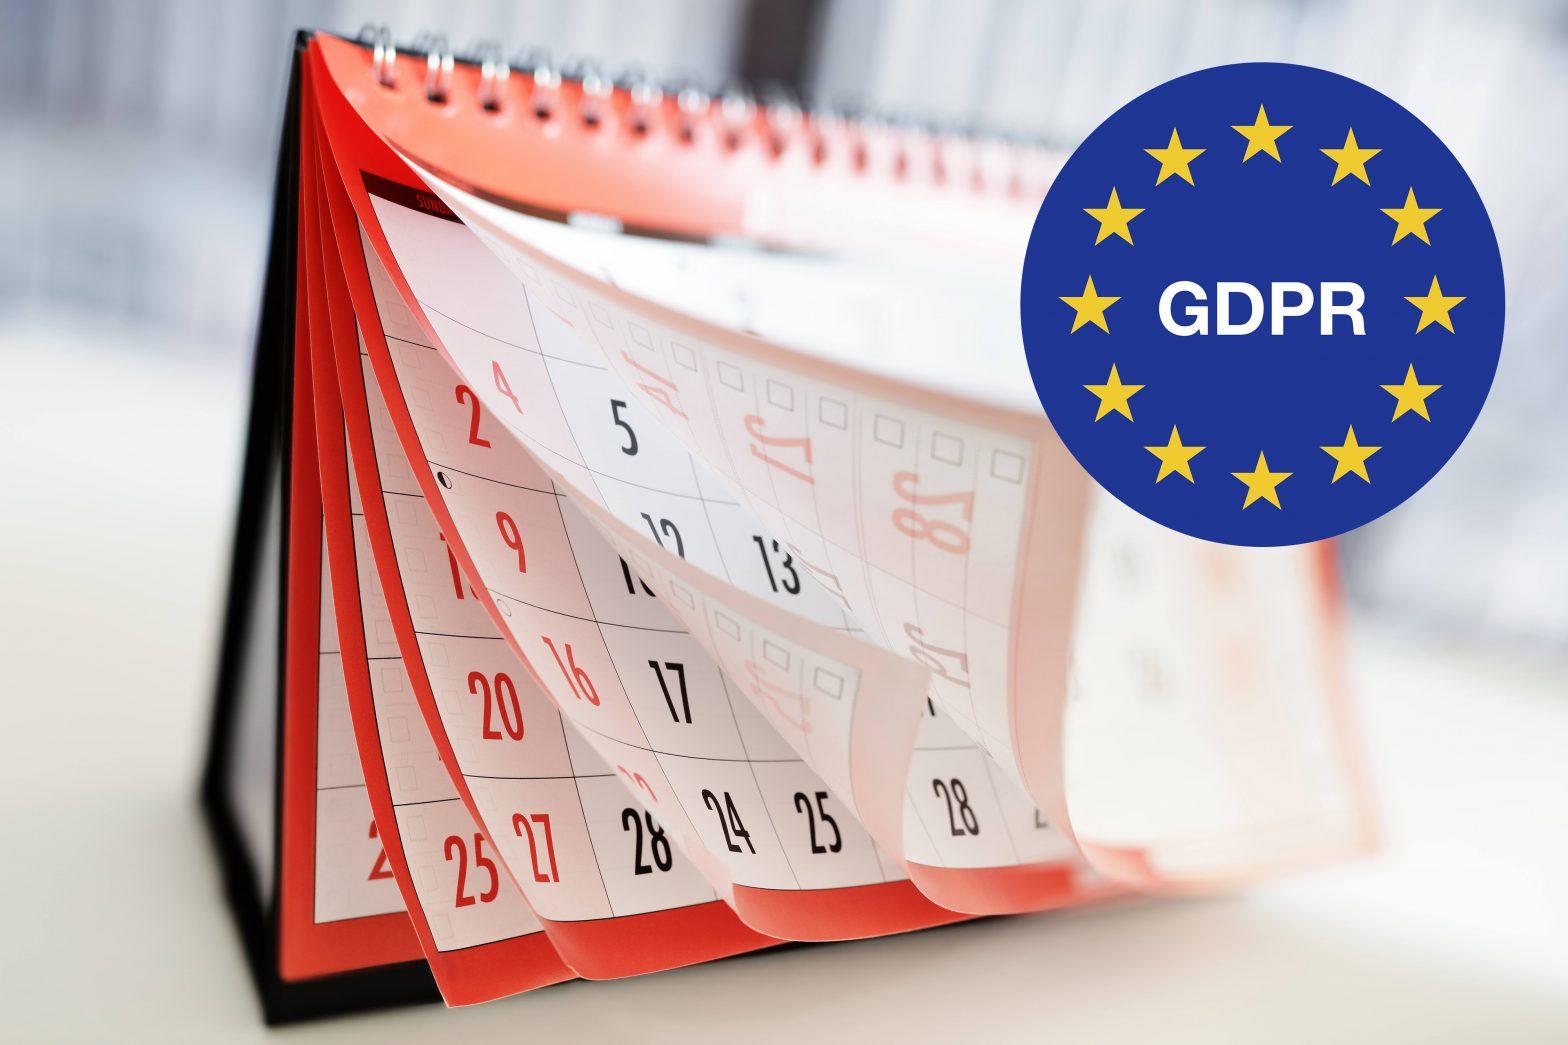 Six Months Of GDPR, Plenty To Report